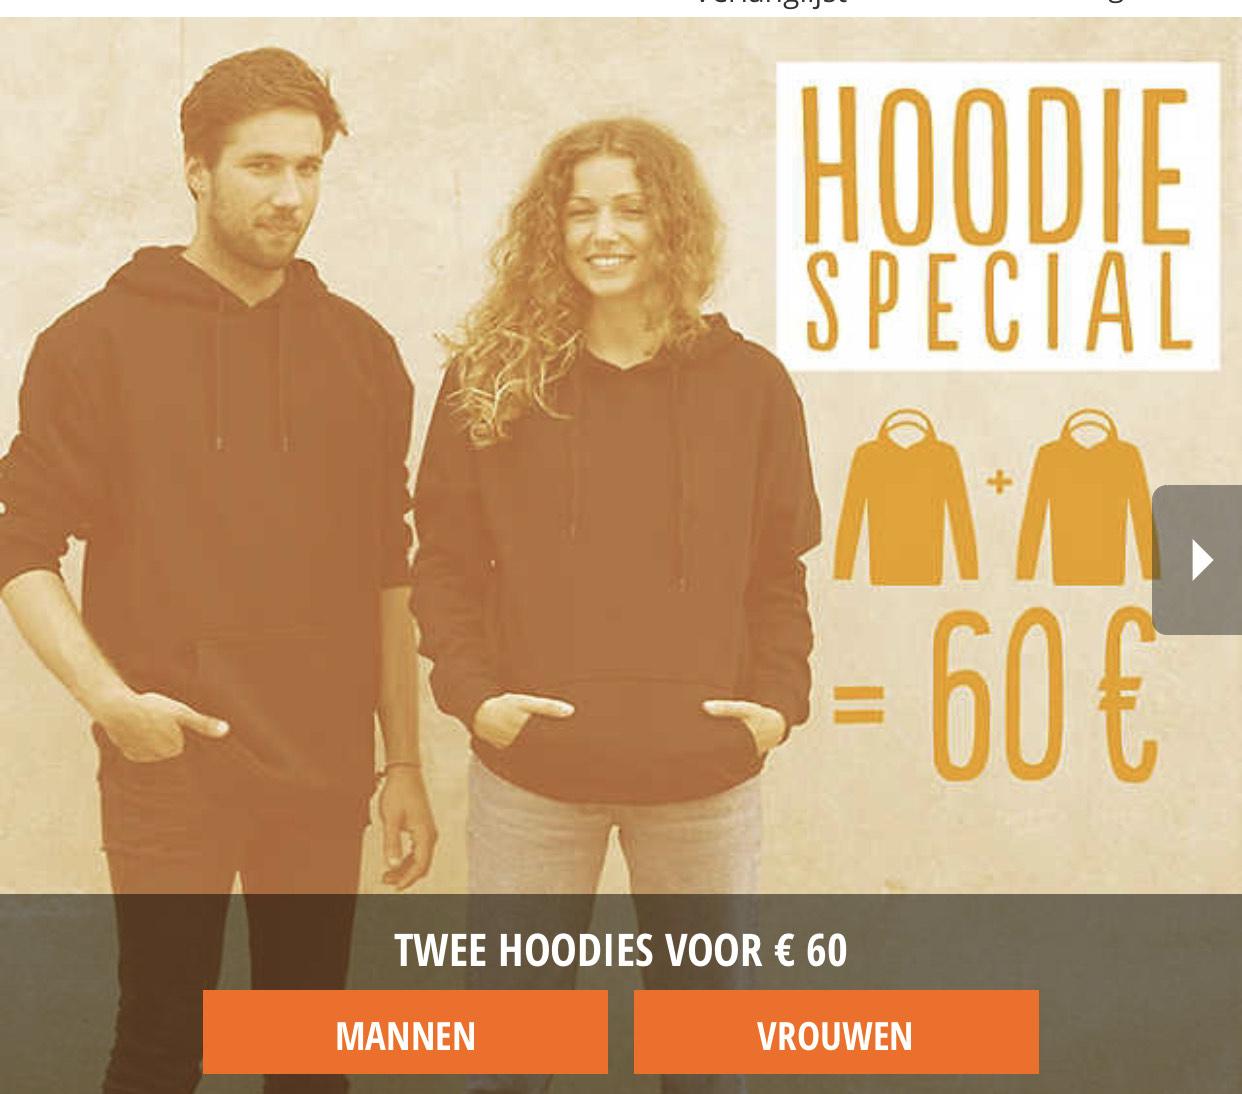 Hoodie Special 2 top merken hoodies voor 60,- @Blue-Tomato